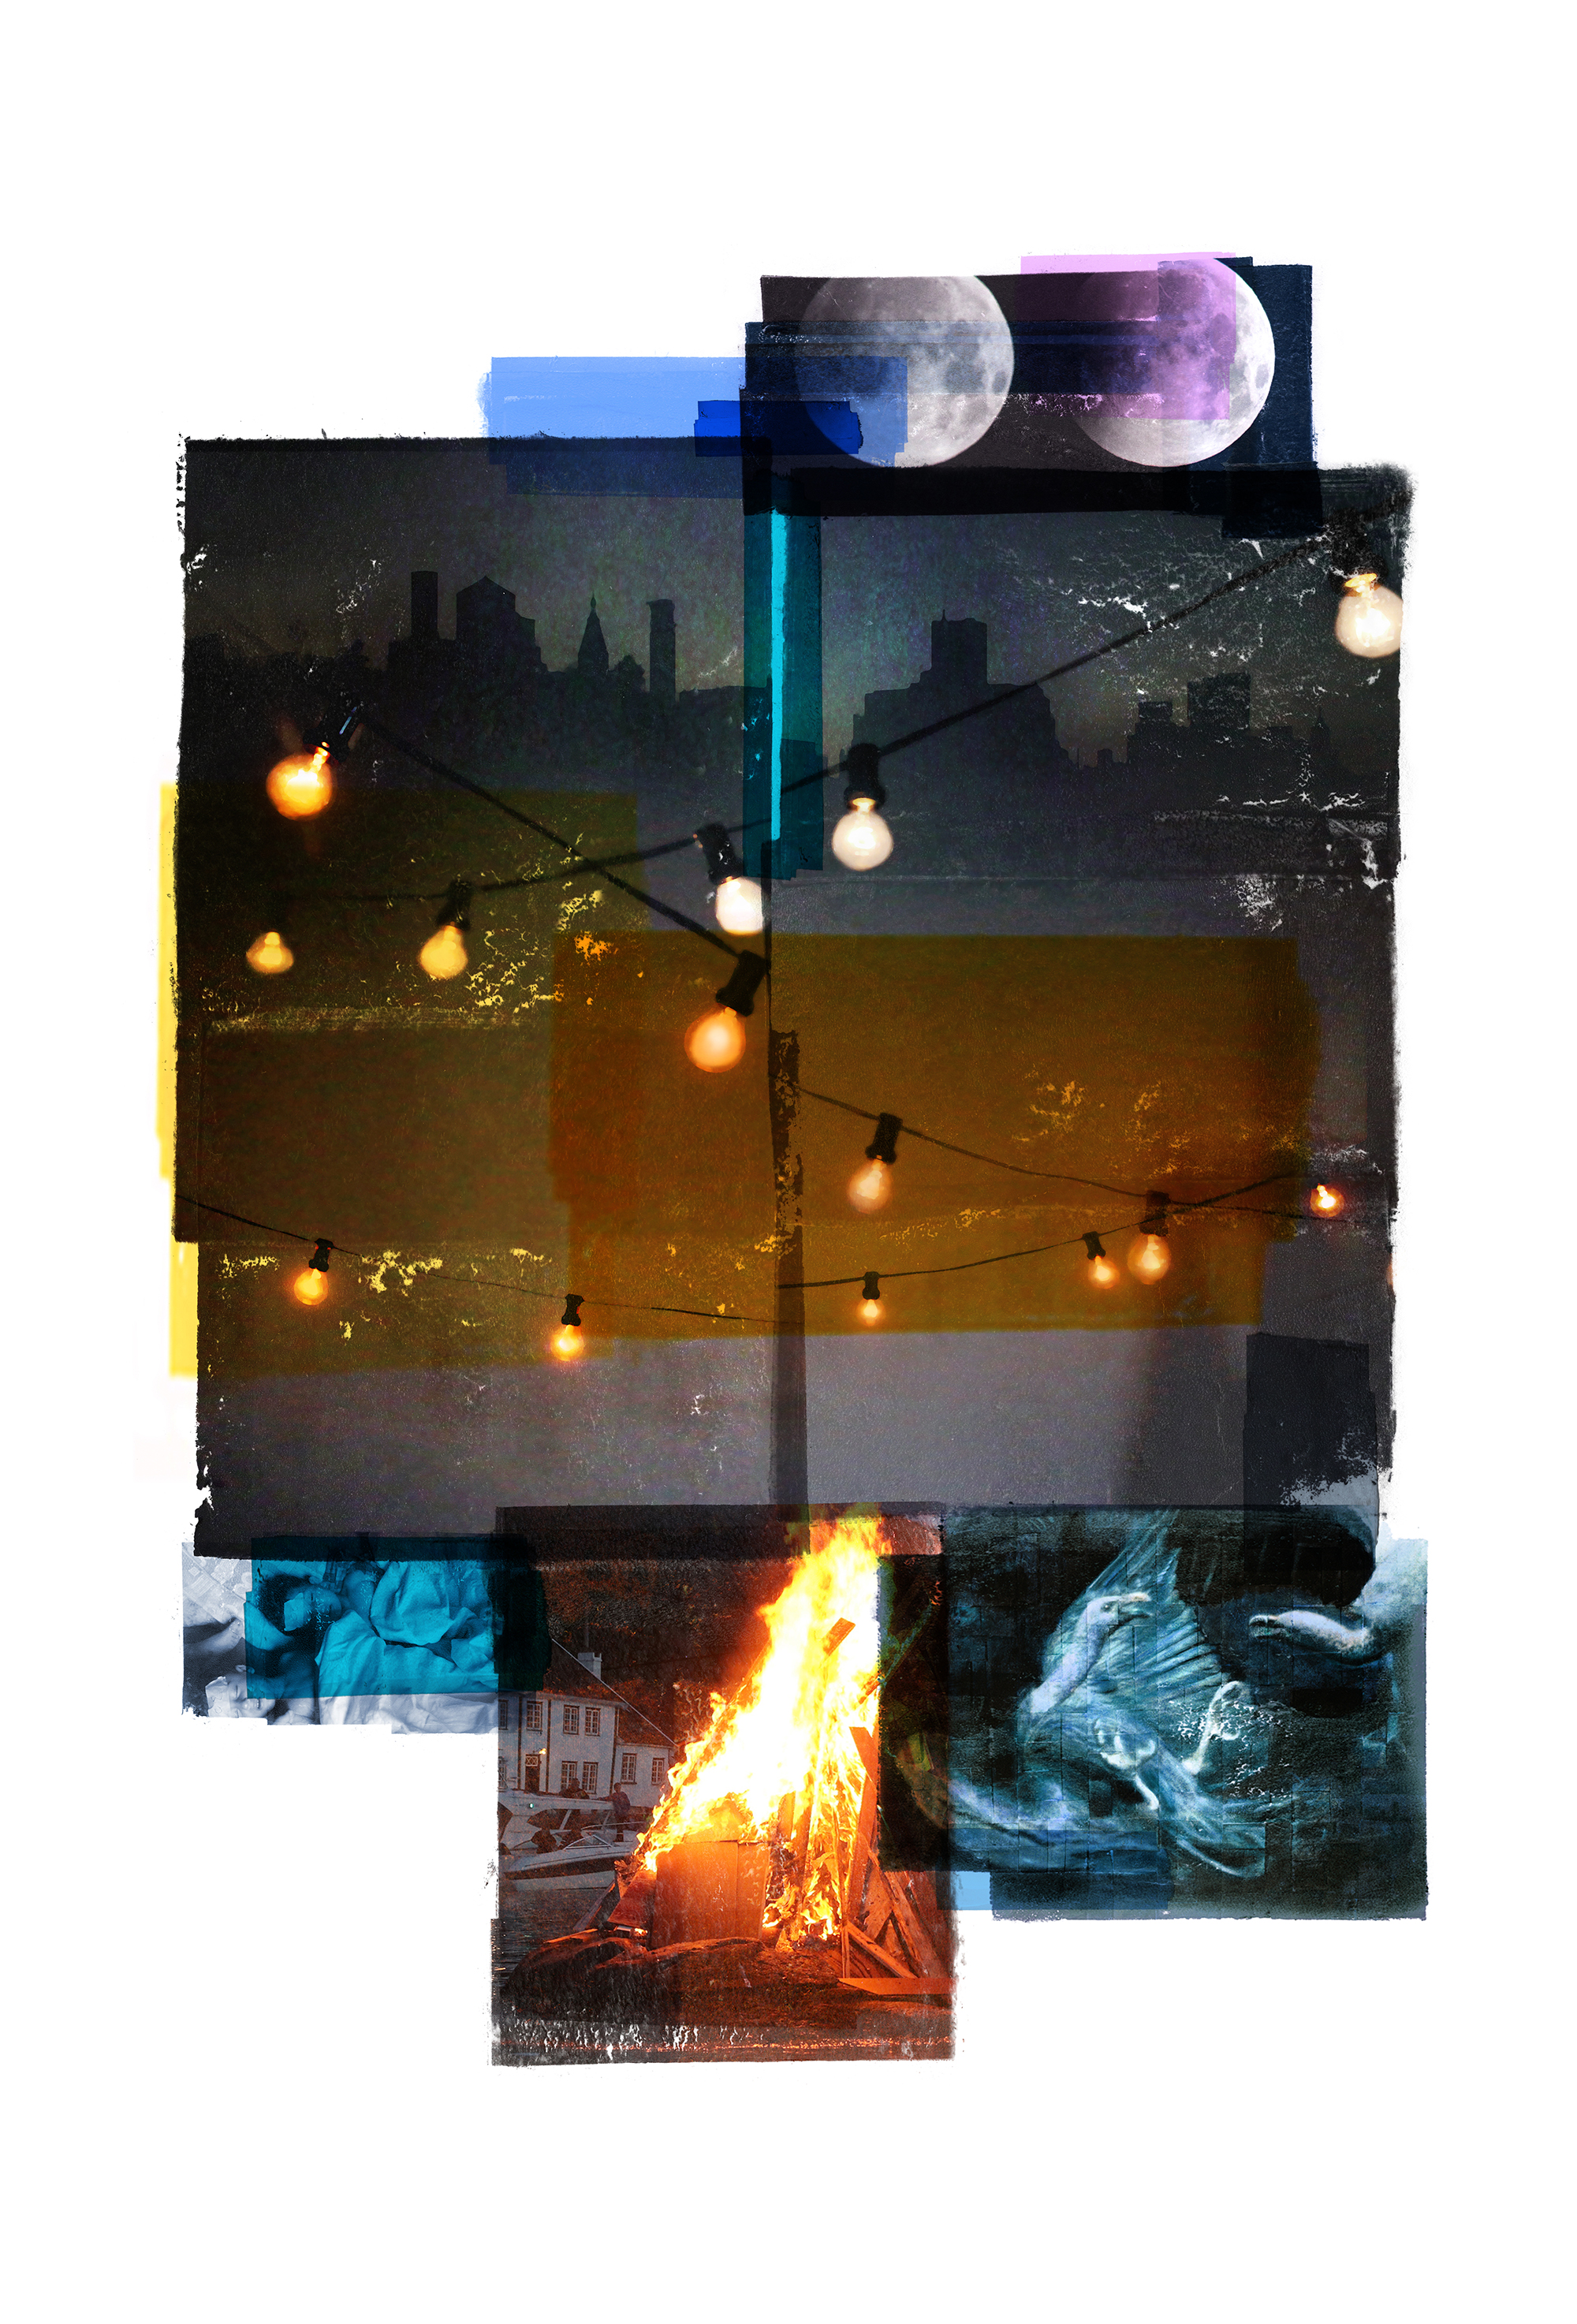 Rim of the party / Moons / Vertical   Original Archival UV Pigment Print / BFK Rives 250 gr 35 x 56 cm / 13,7 x 22 in Edition of 70 + 7 Ap Editeur: Per Fronth Studios / Printer Henrik Aunevik  27/2016: